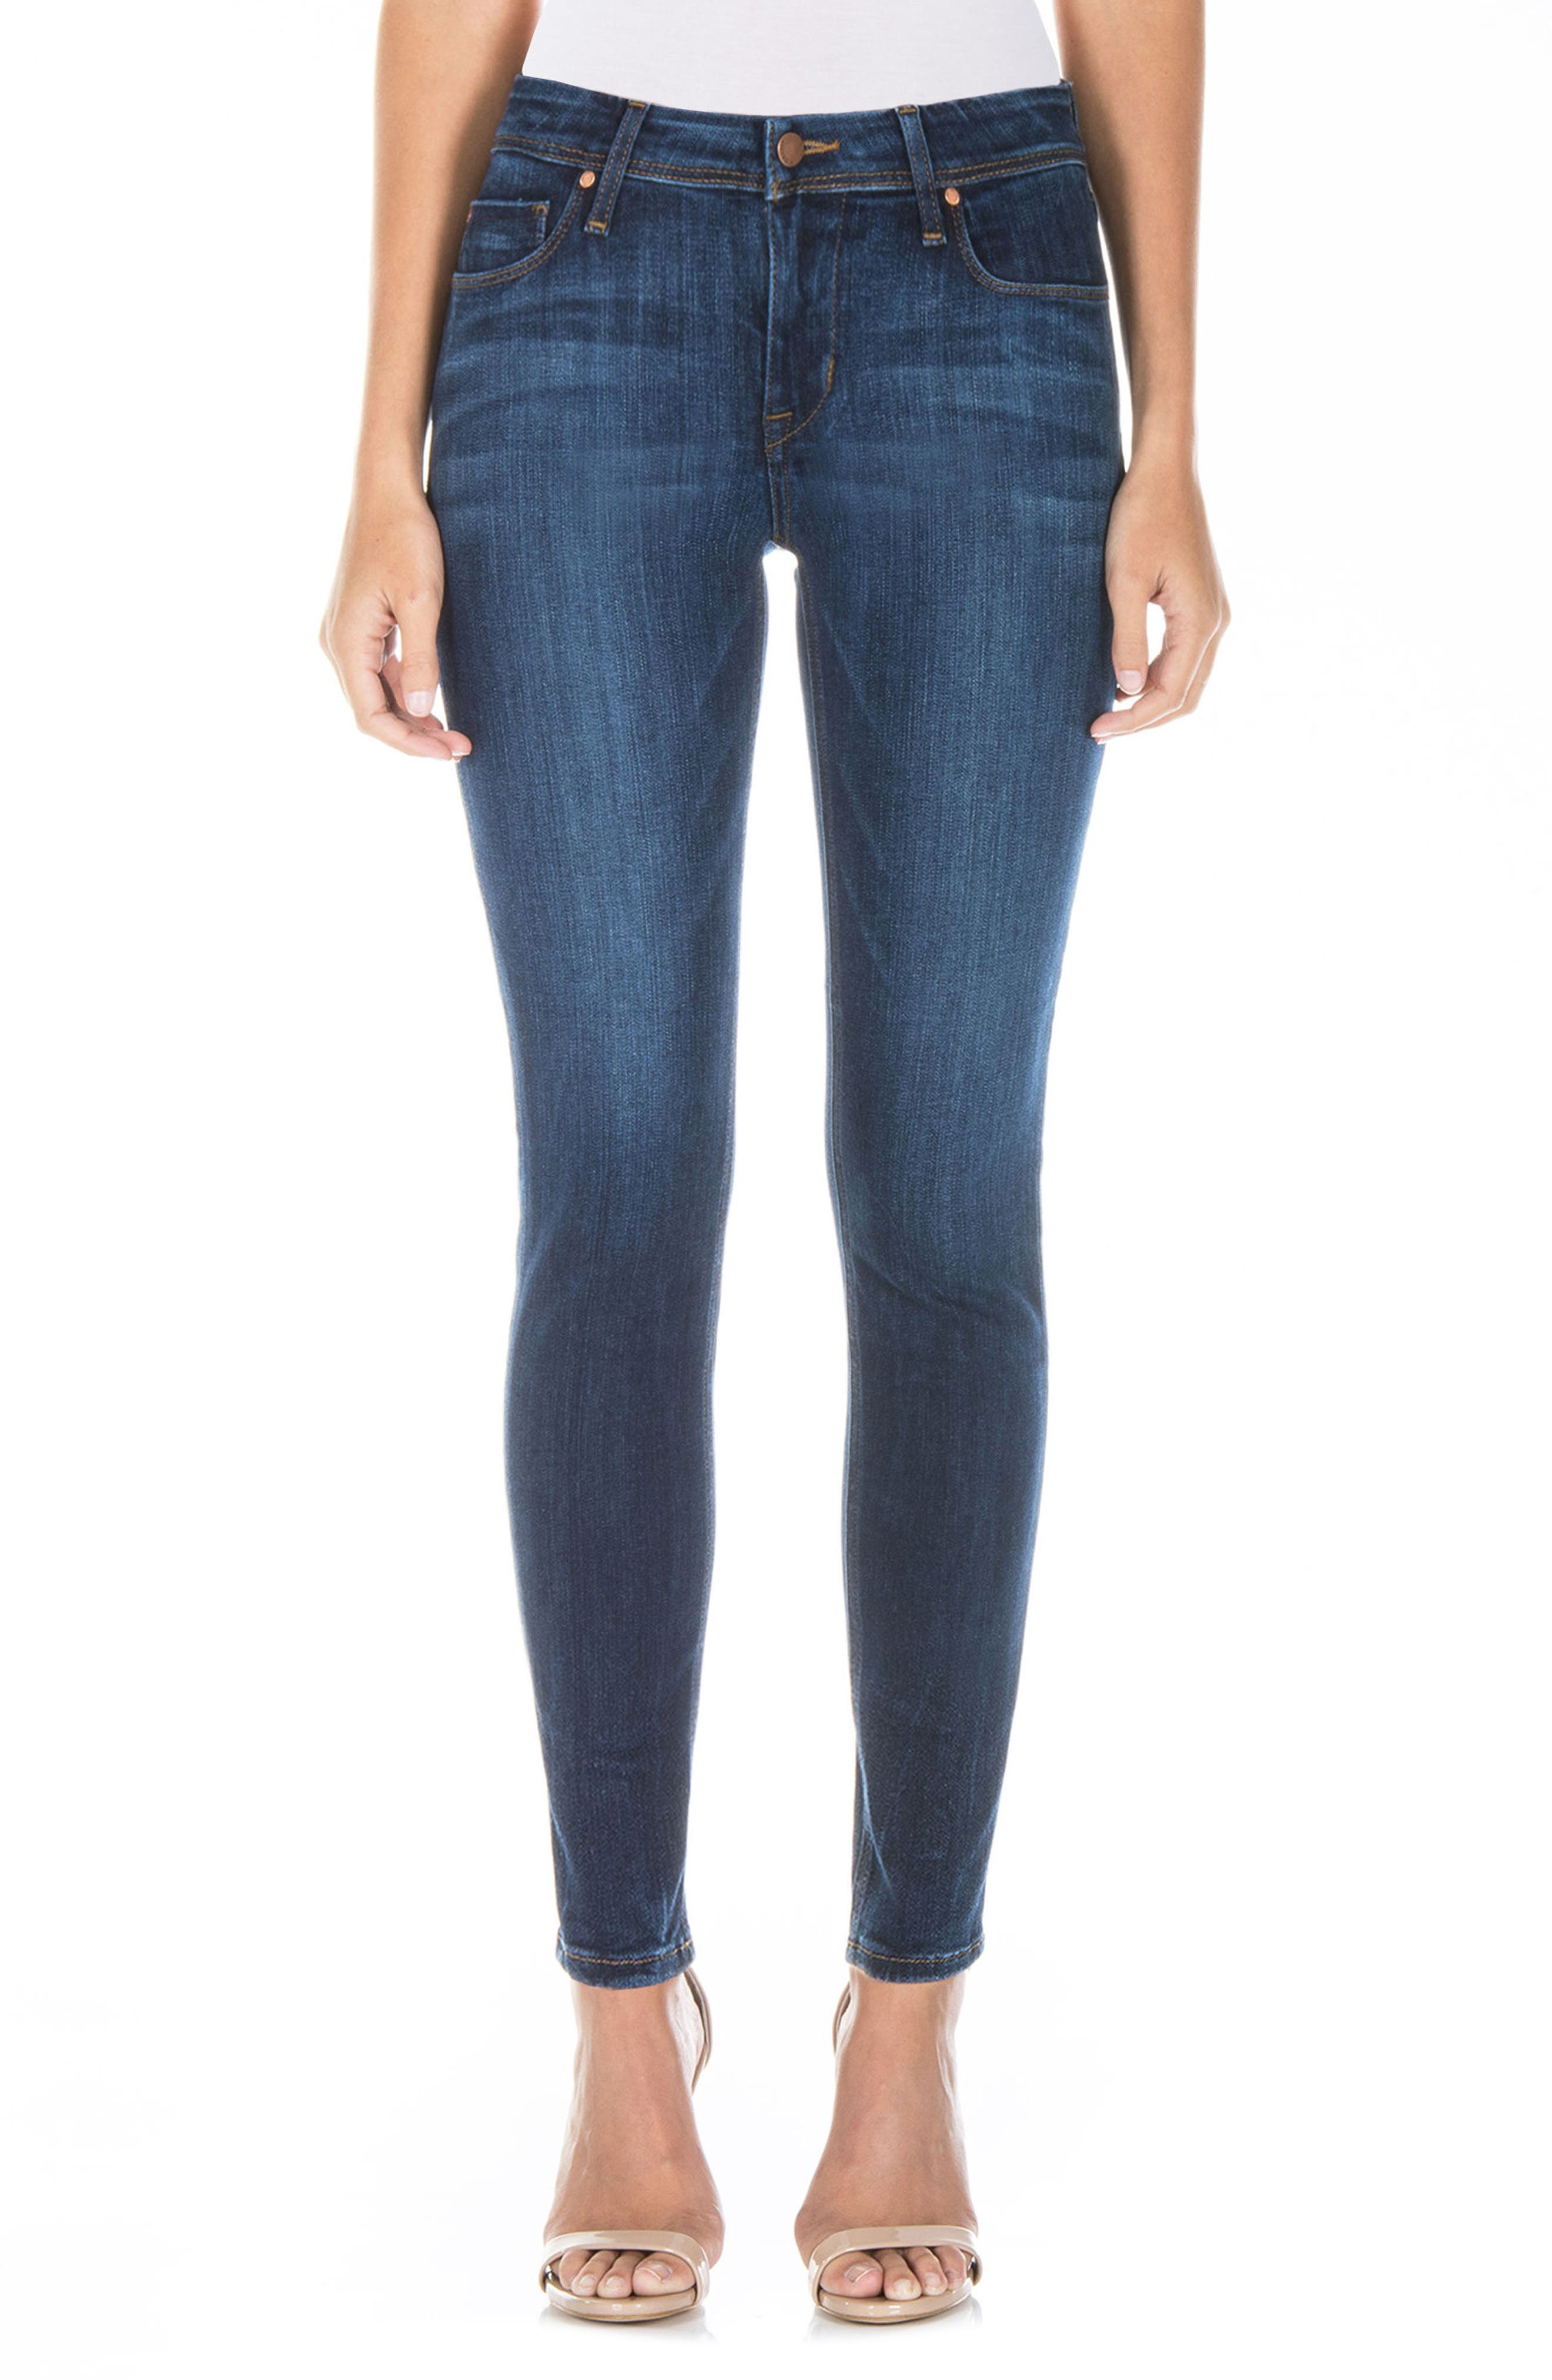 Main Image - Fidelity Denim Gwen High Waist Skinny Jeans (Falcon Blue)